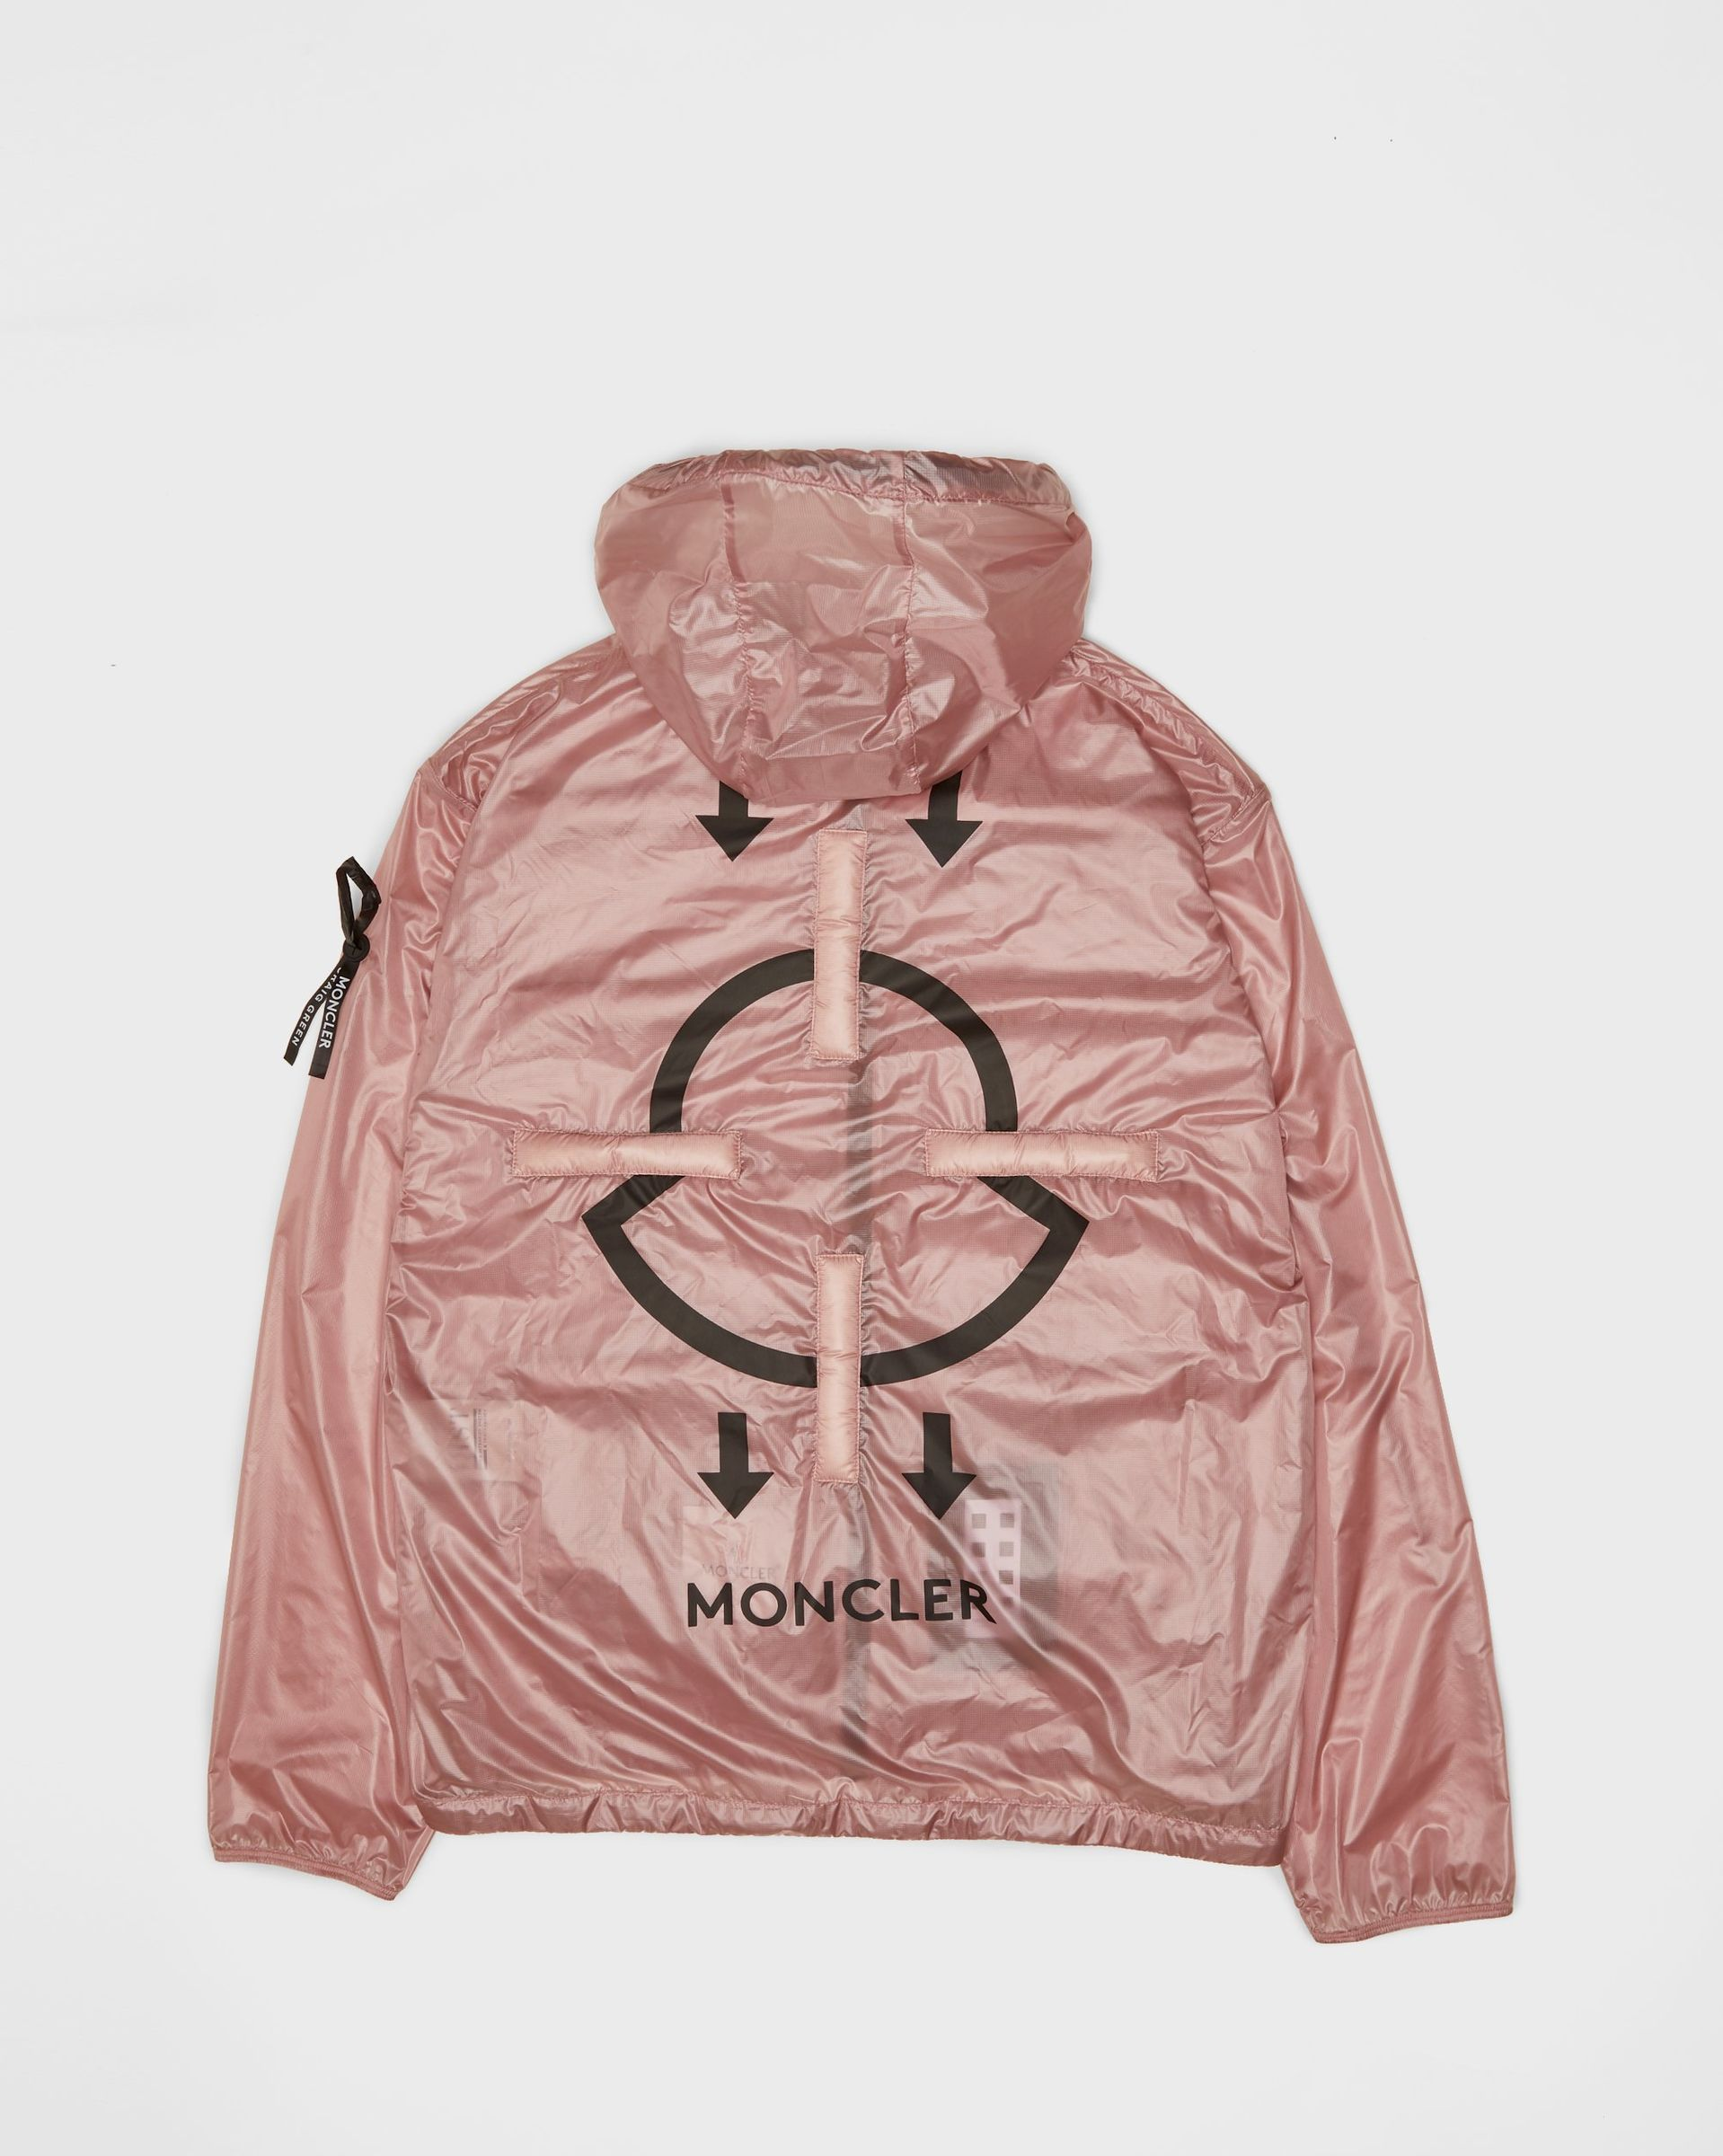 5 Moncler Craig Green - Peeve Jacket Rose - Image 2